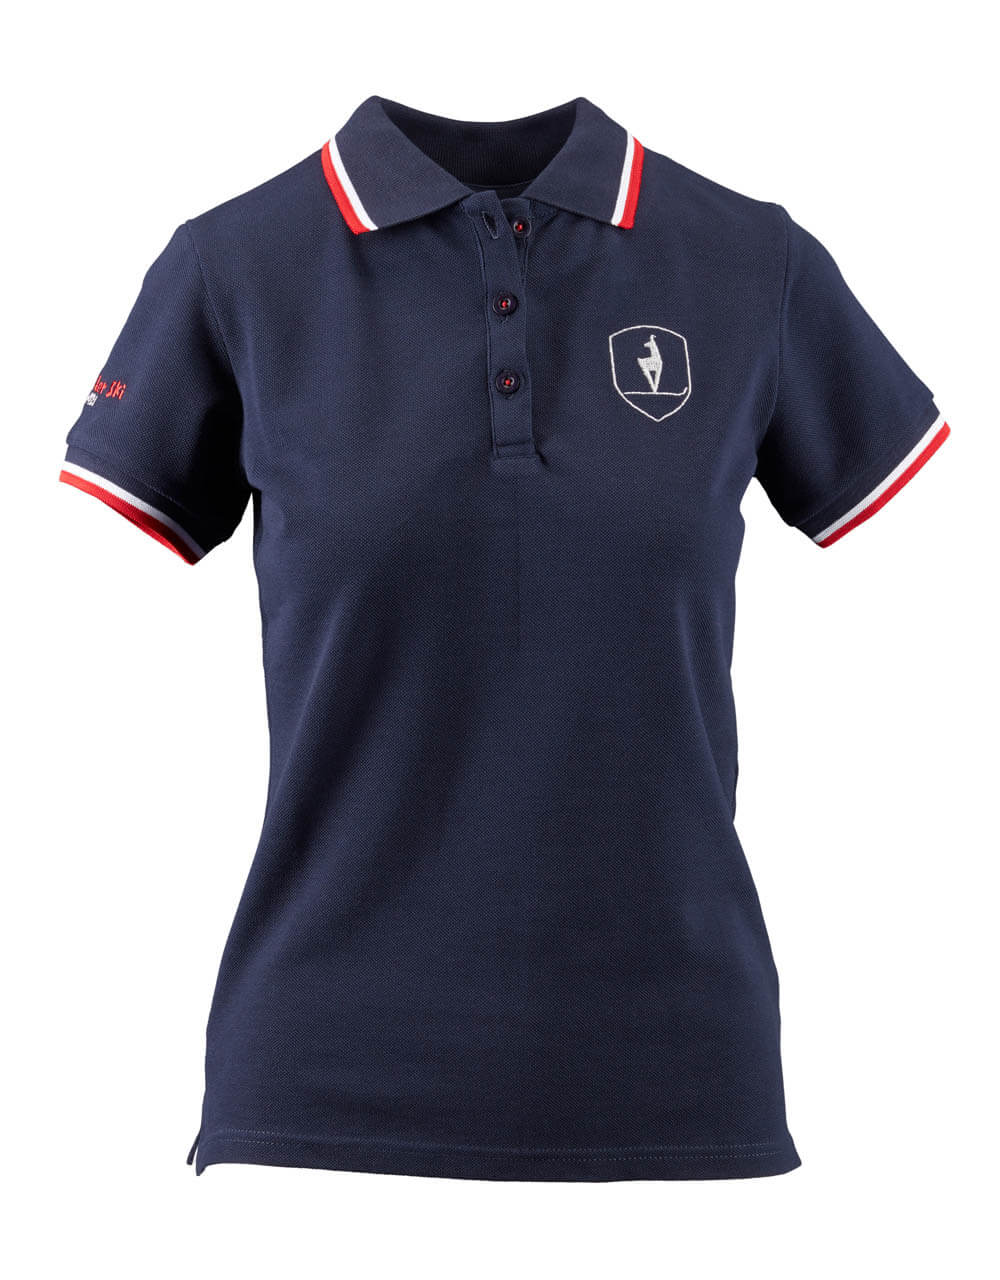 689125001 Damen Polo blau